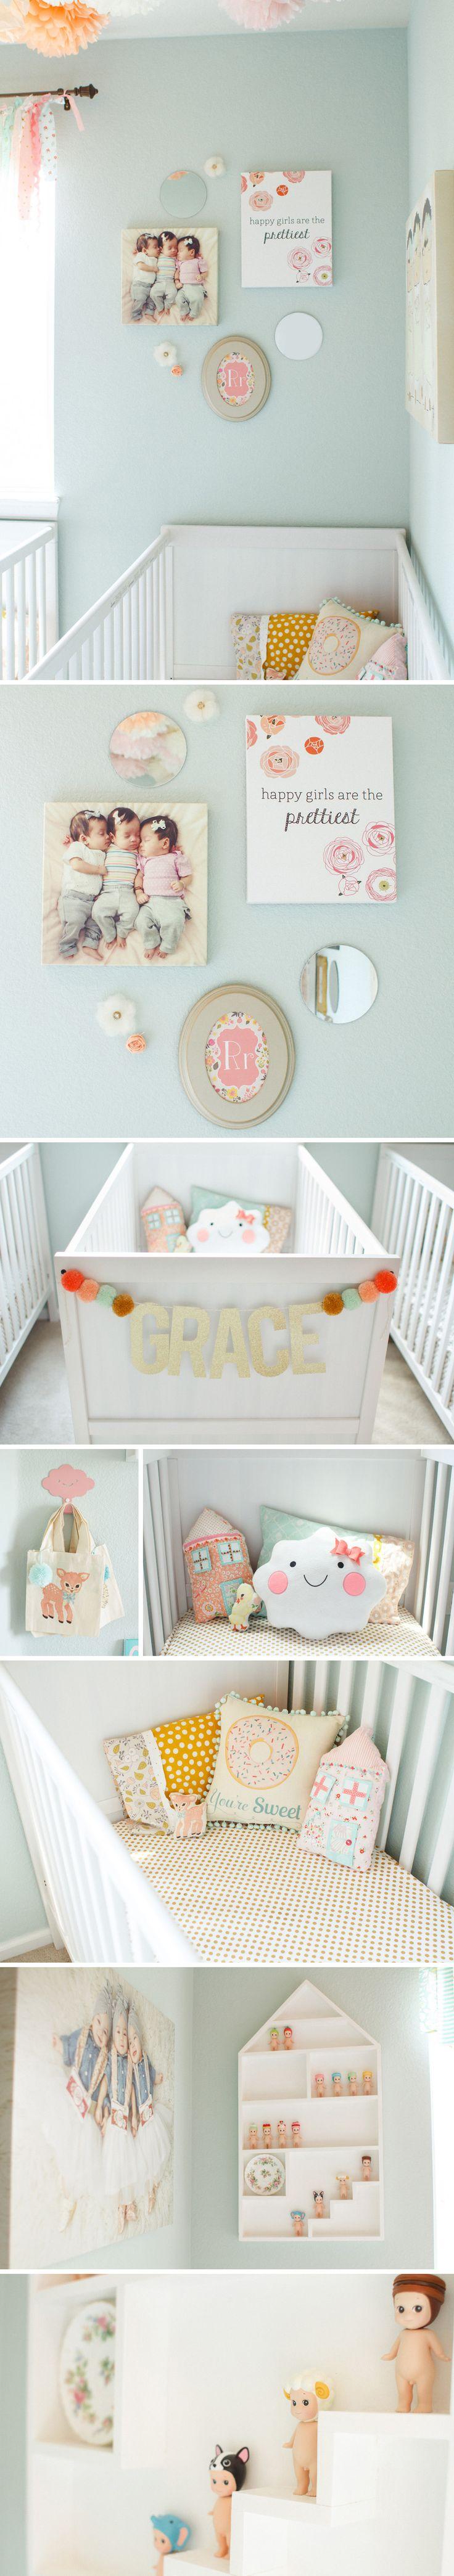 nursery blog collage 21 Operation Robinson Triplet Nursery Complete